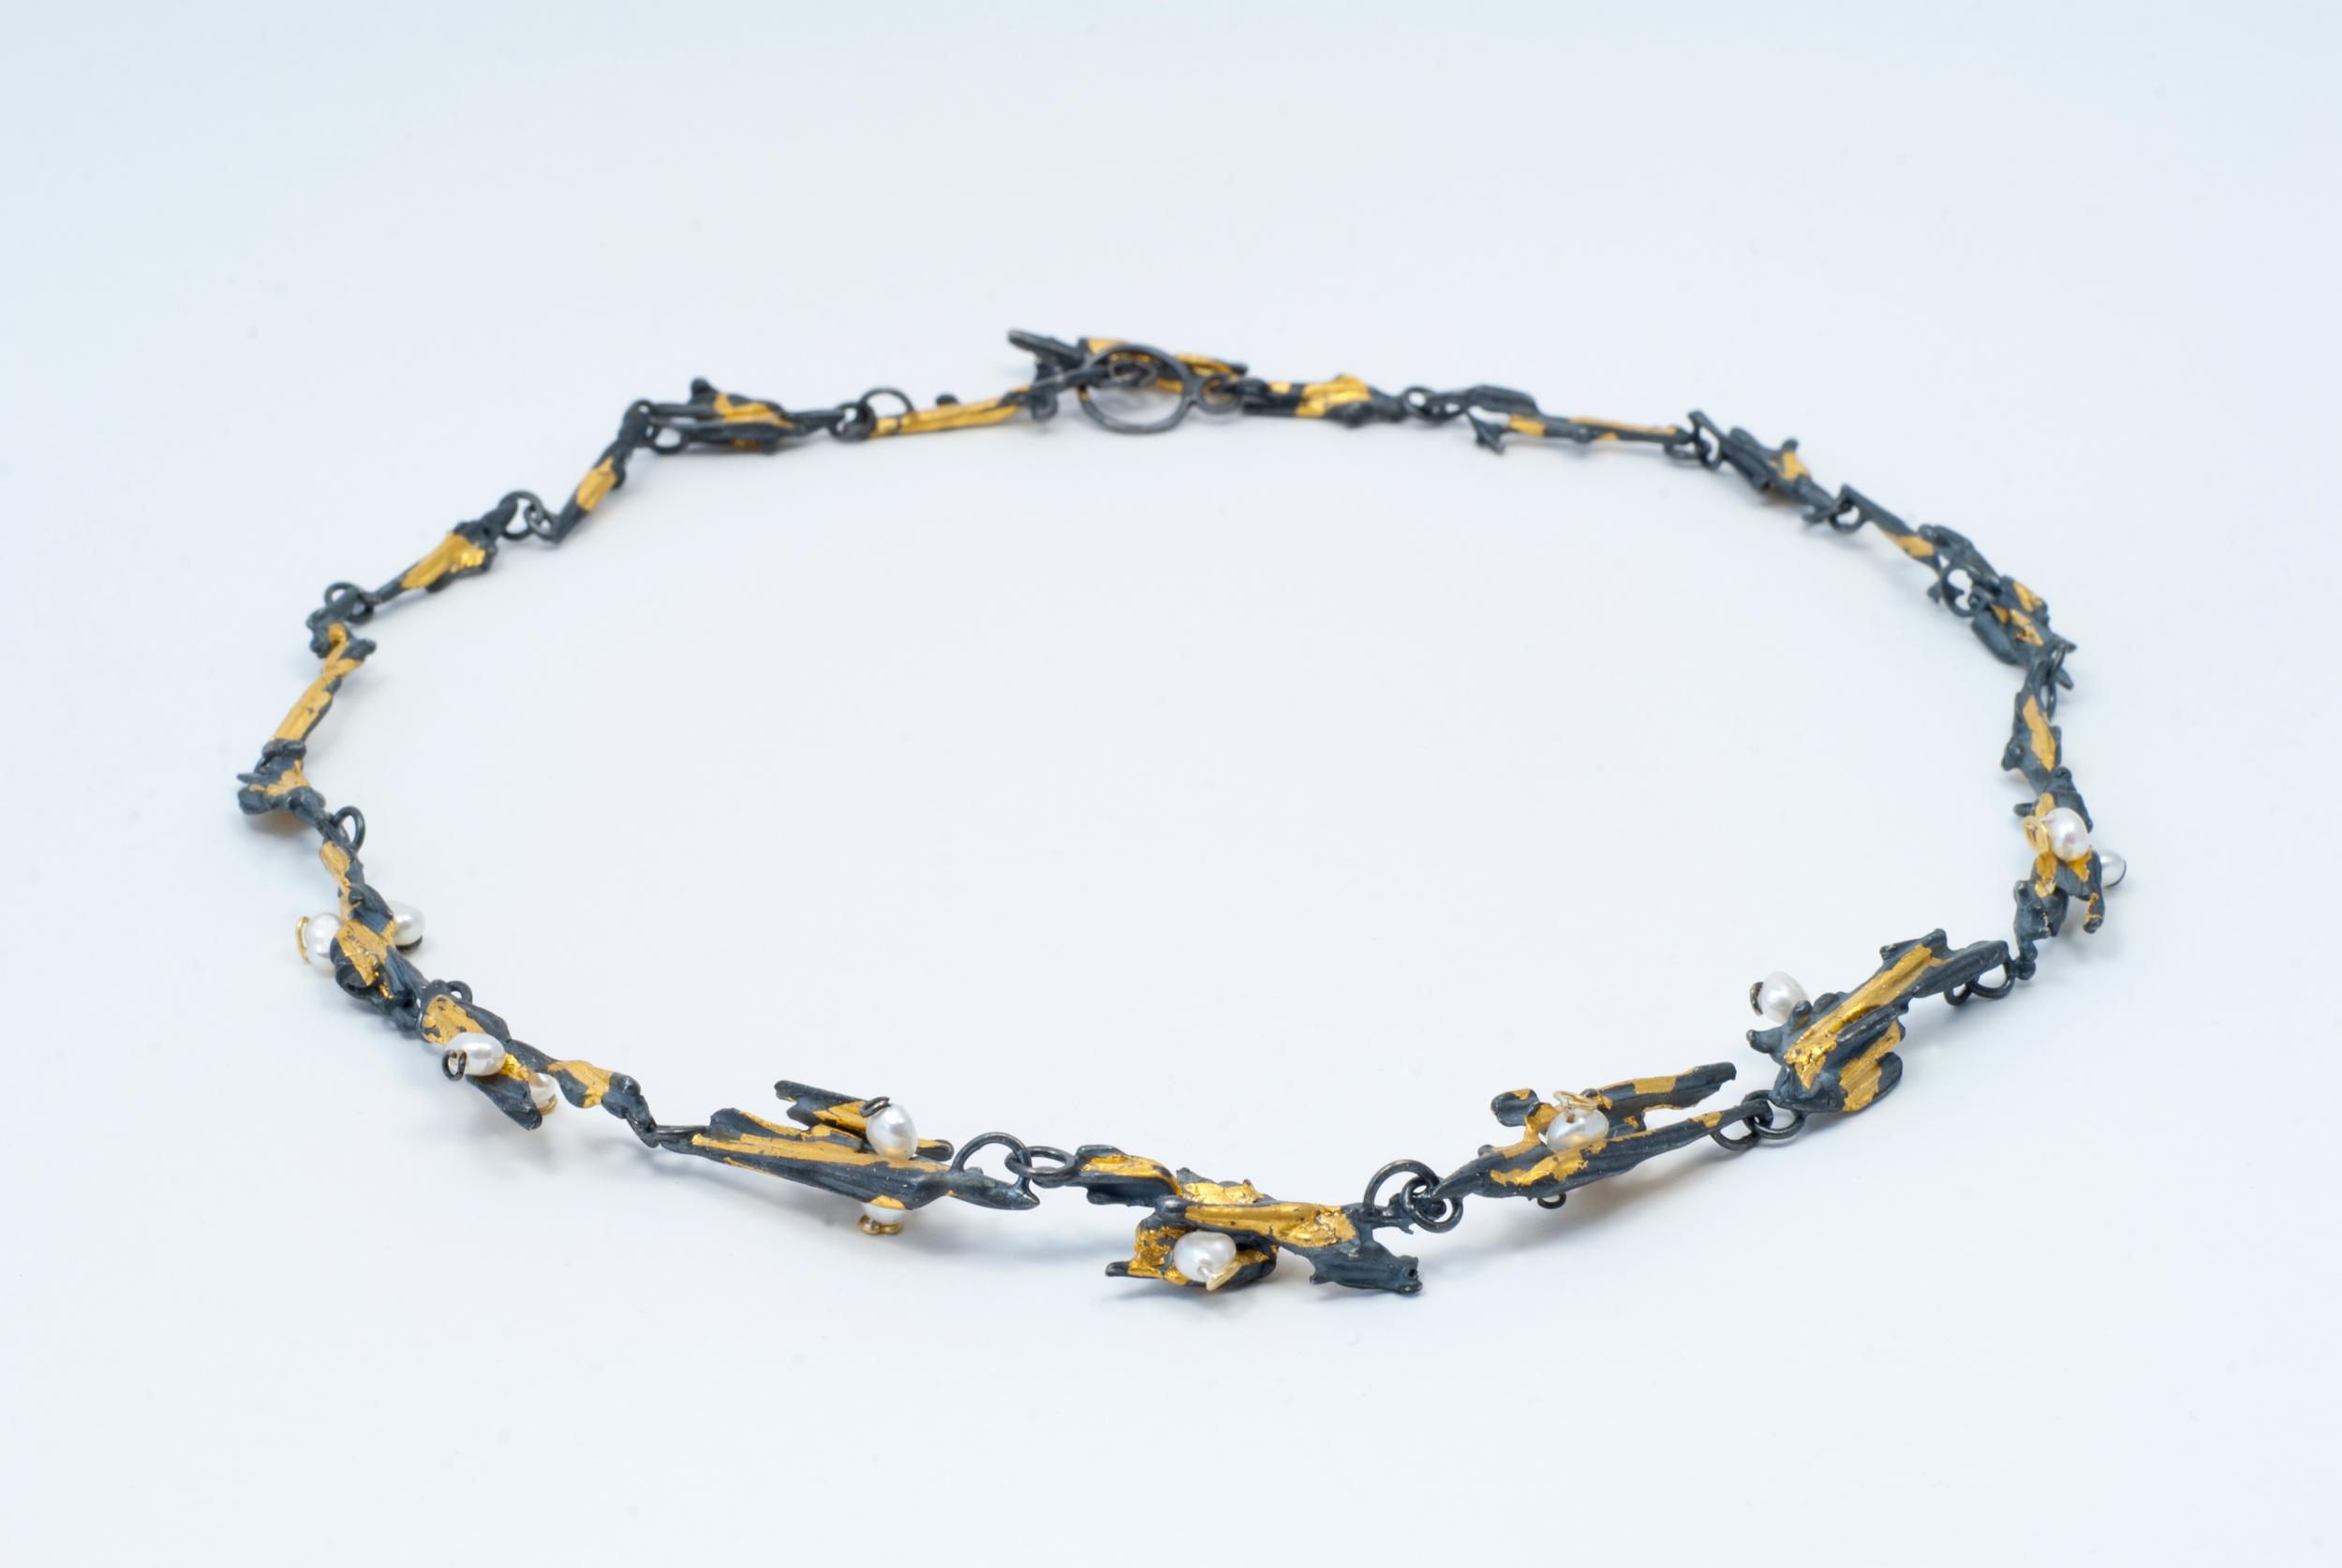 Keum-boo-pearl-necklace-web.jpg